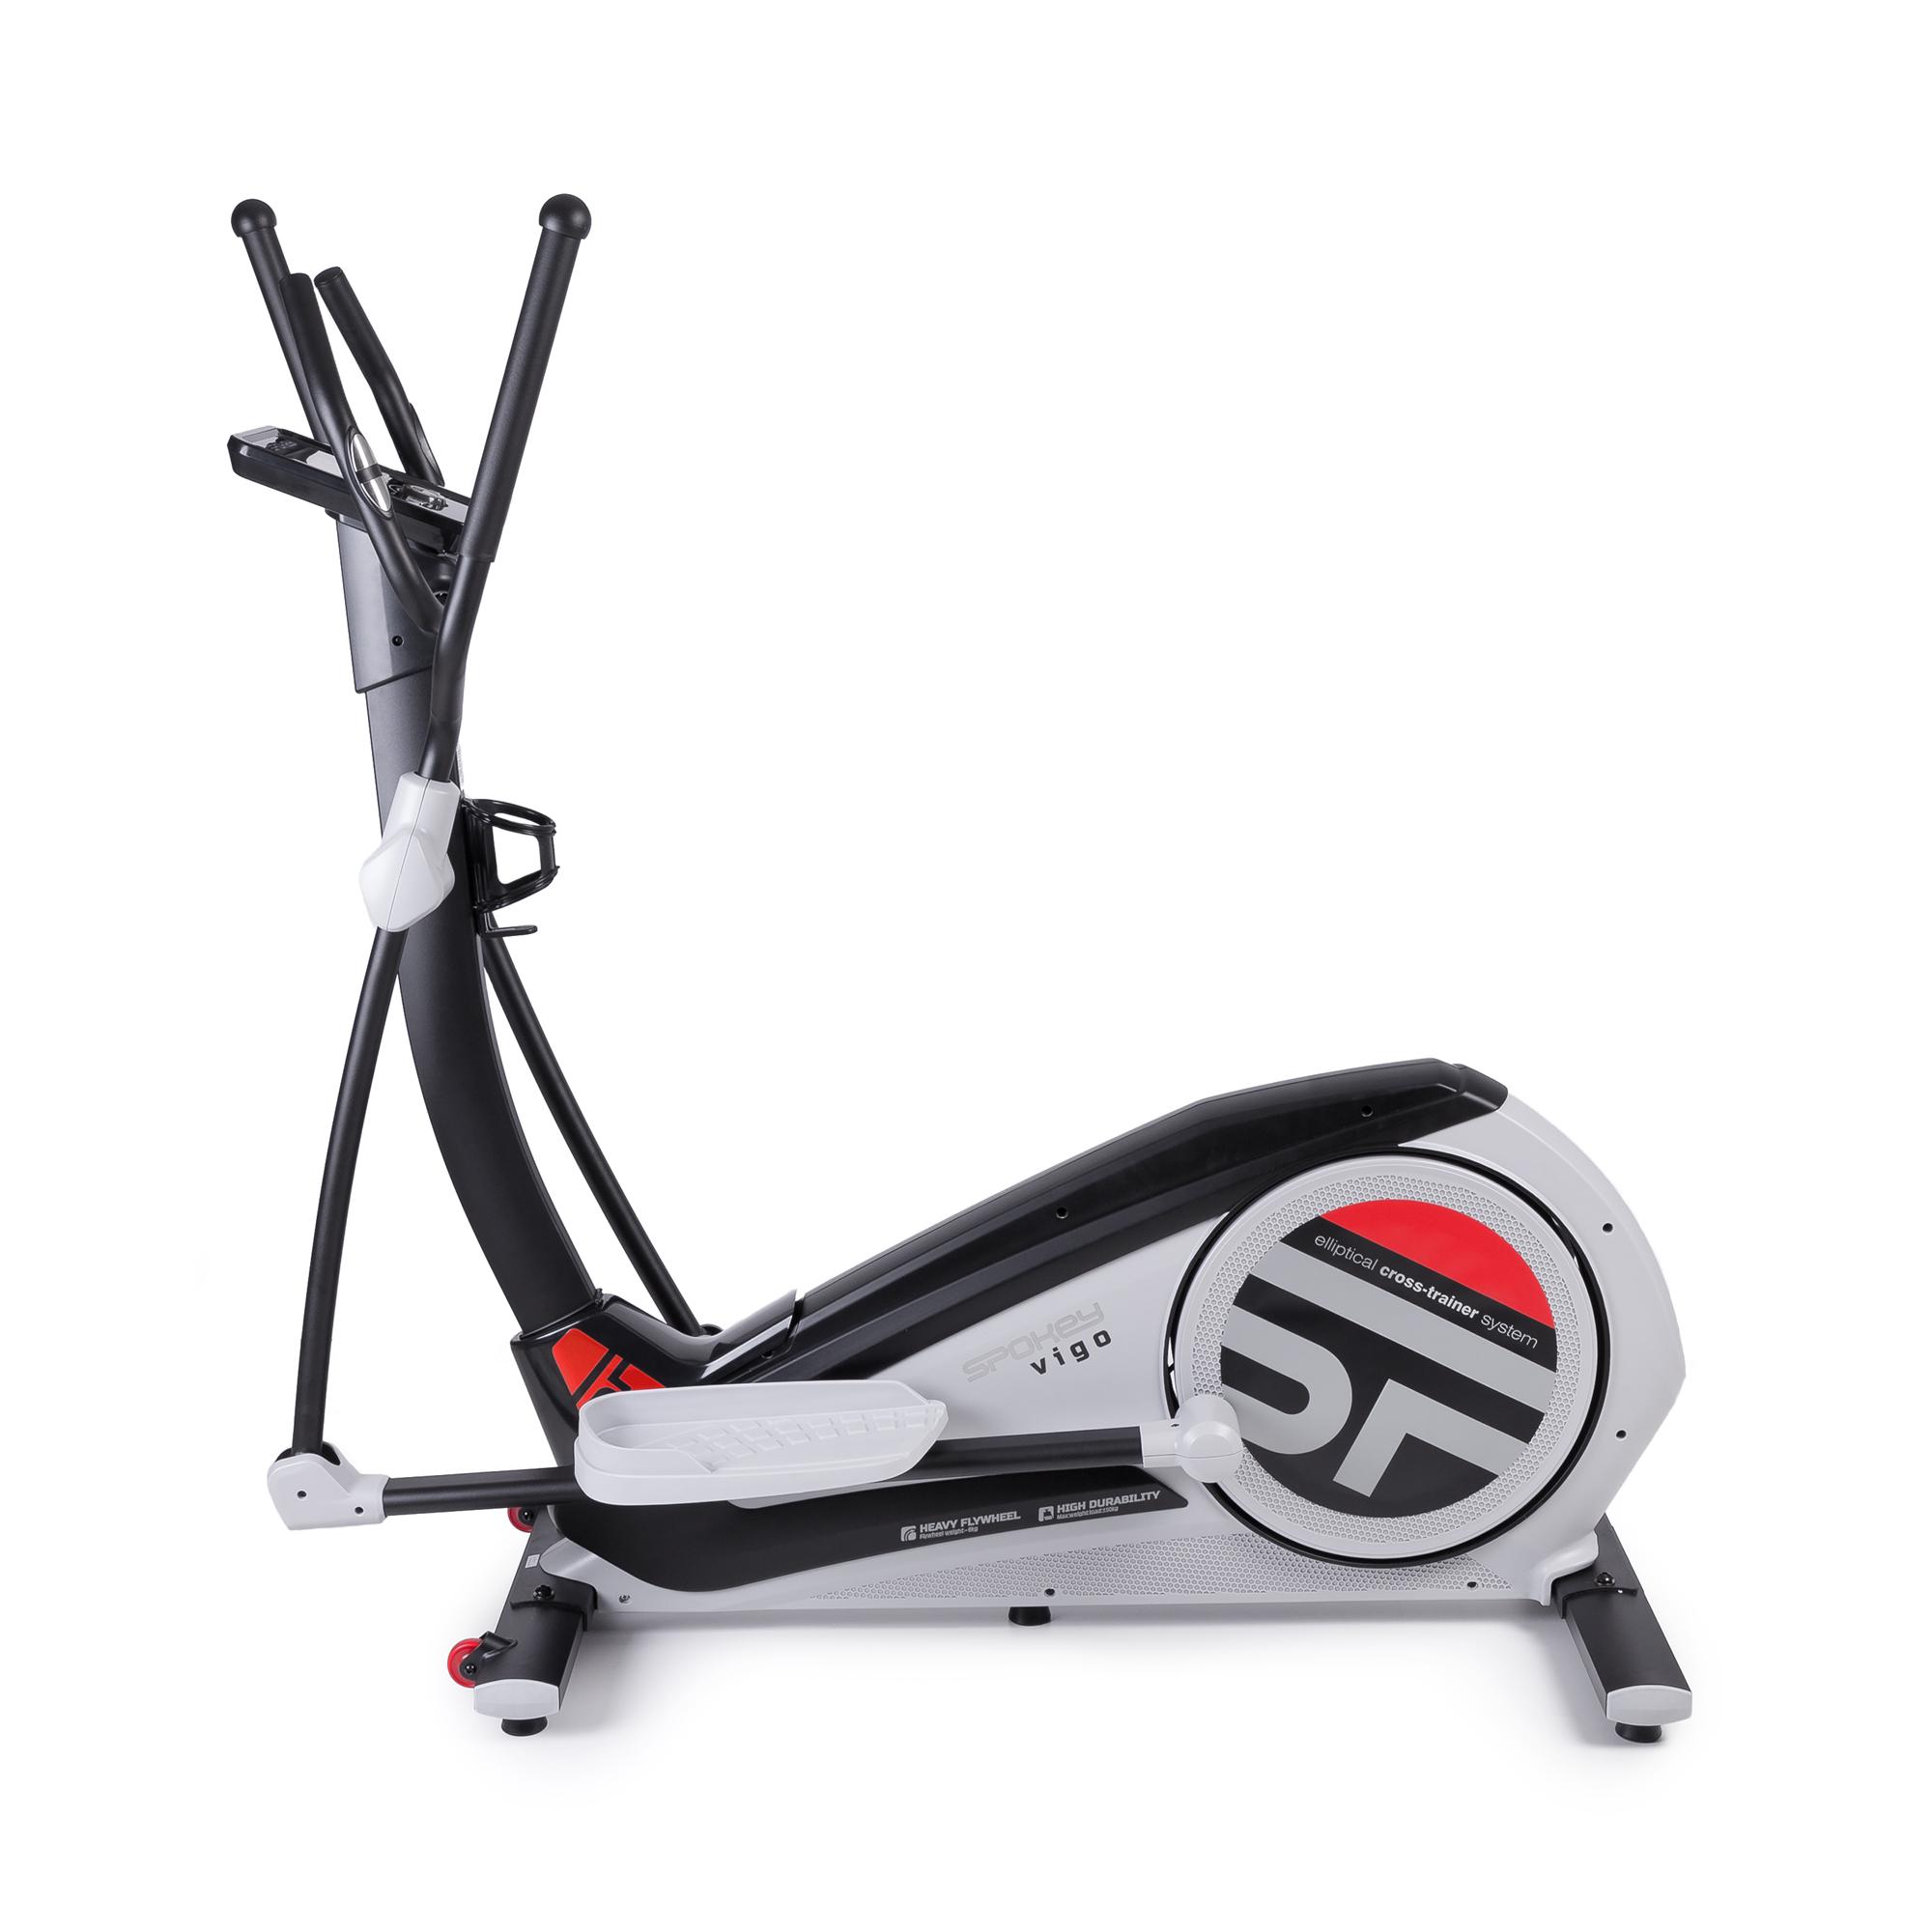 Elliptical Bike Definition: Elliptical Trainers VIGO II